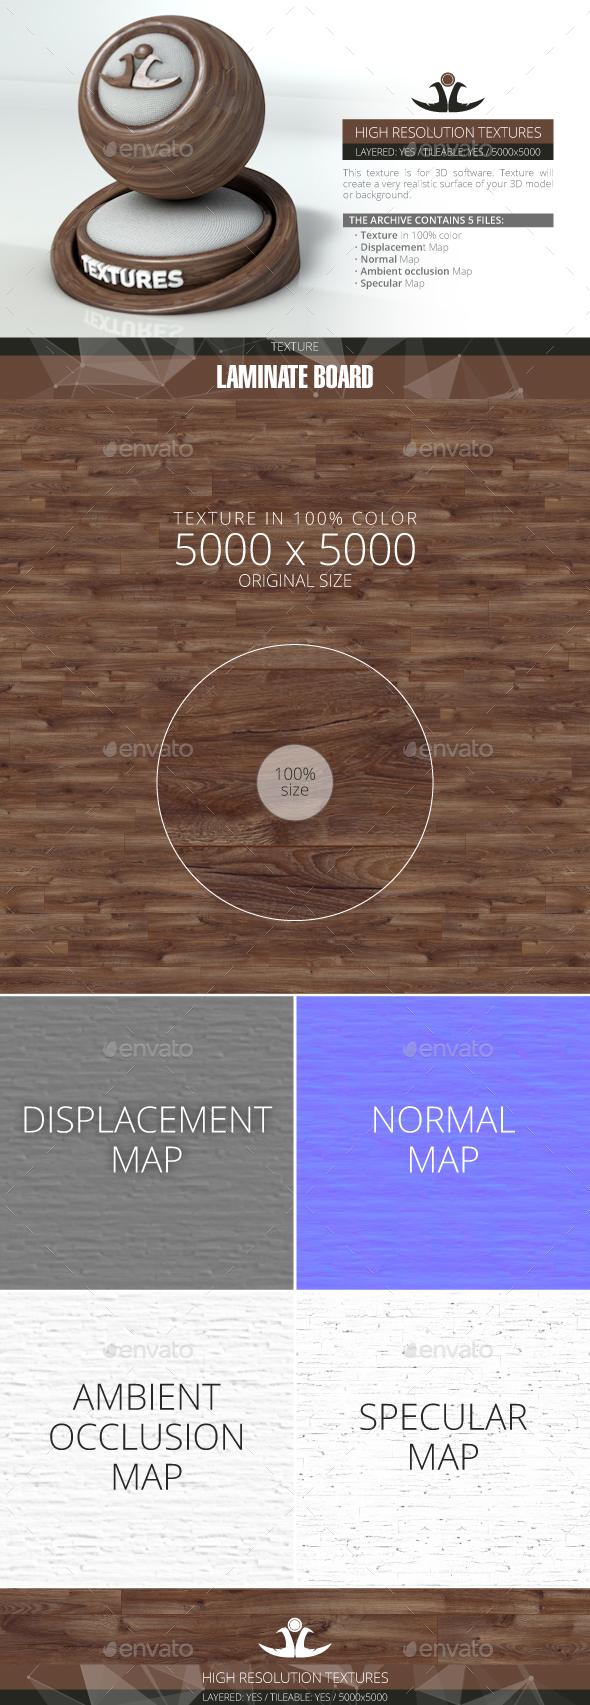 Laminate Board 54 - 3DOcean Item for Sale